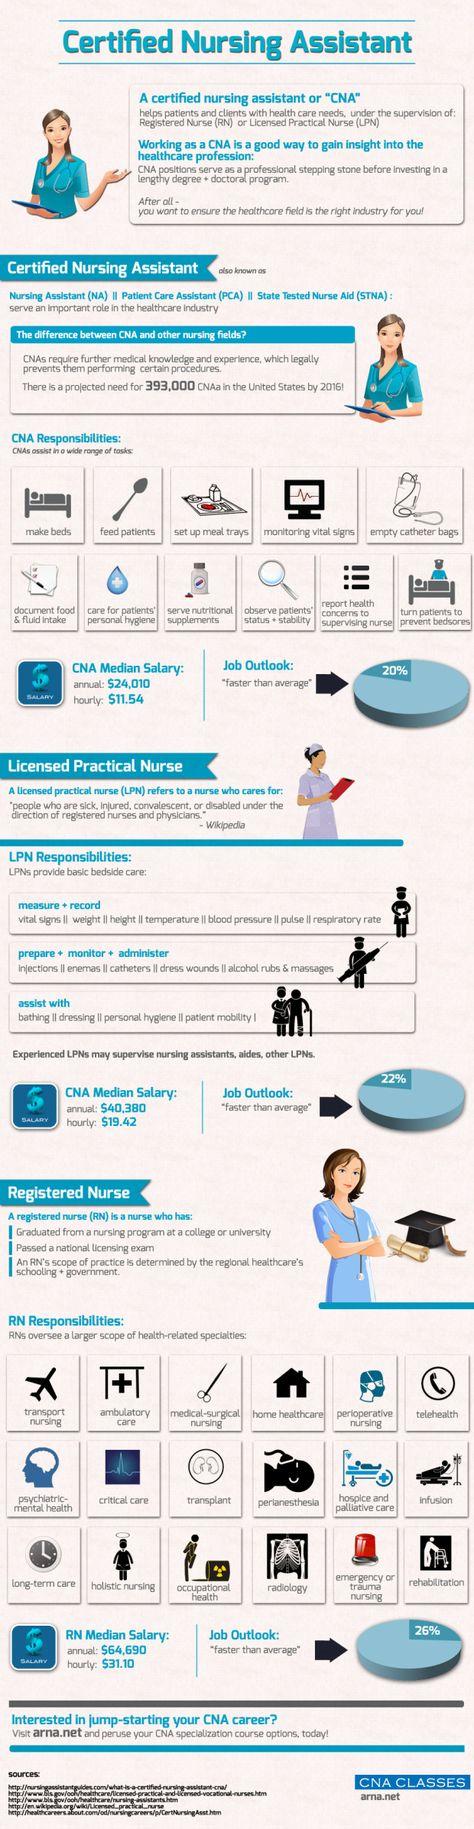 A great CNA (Certified Nursing Assistant) educational infographic. www.CNAPursuit.com